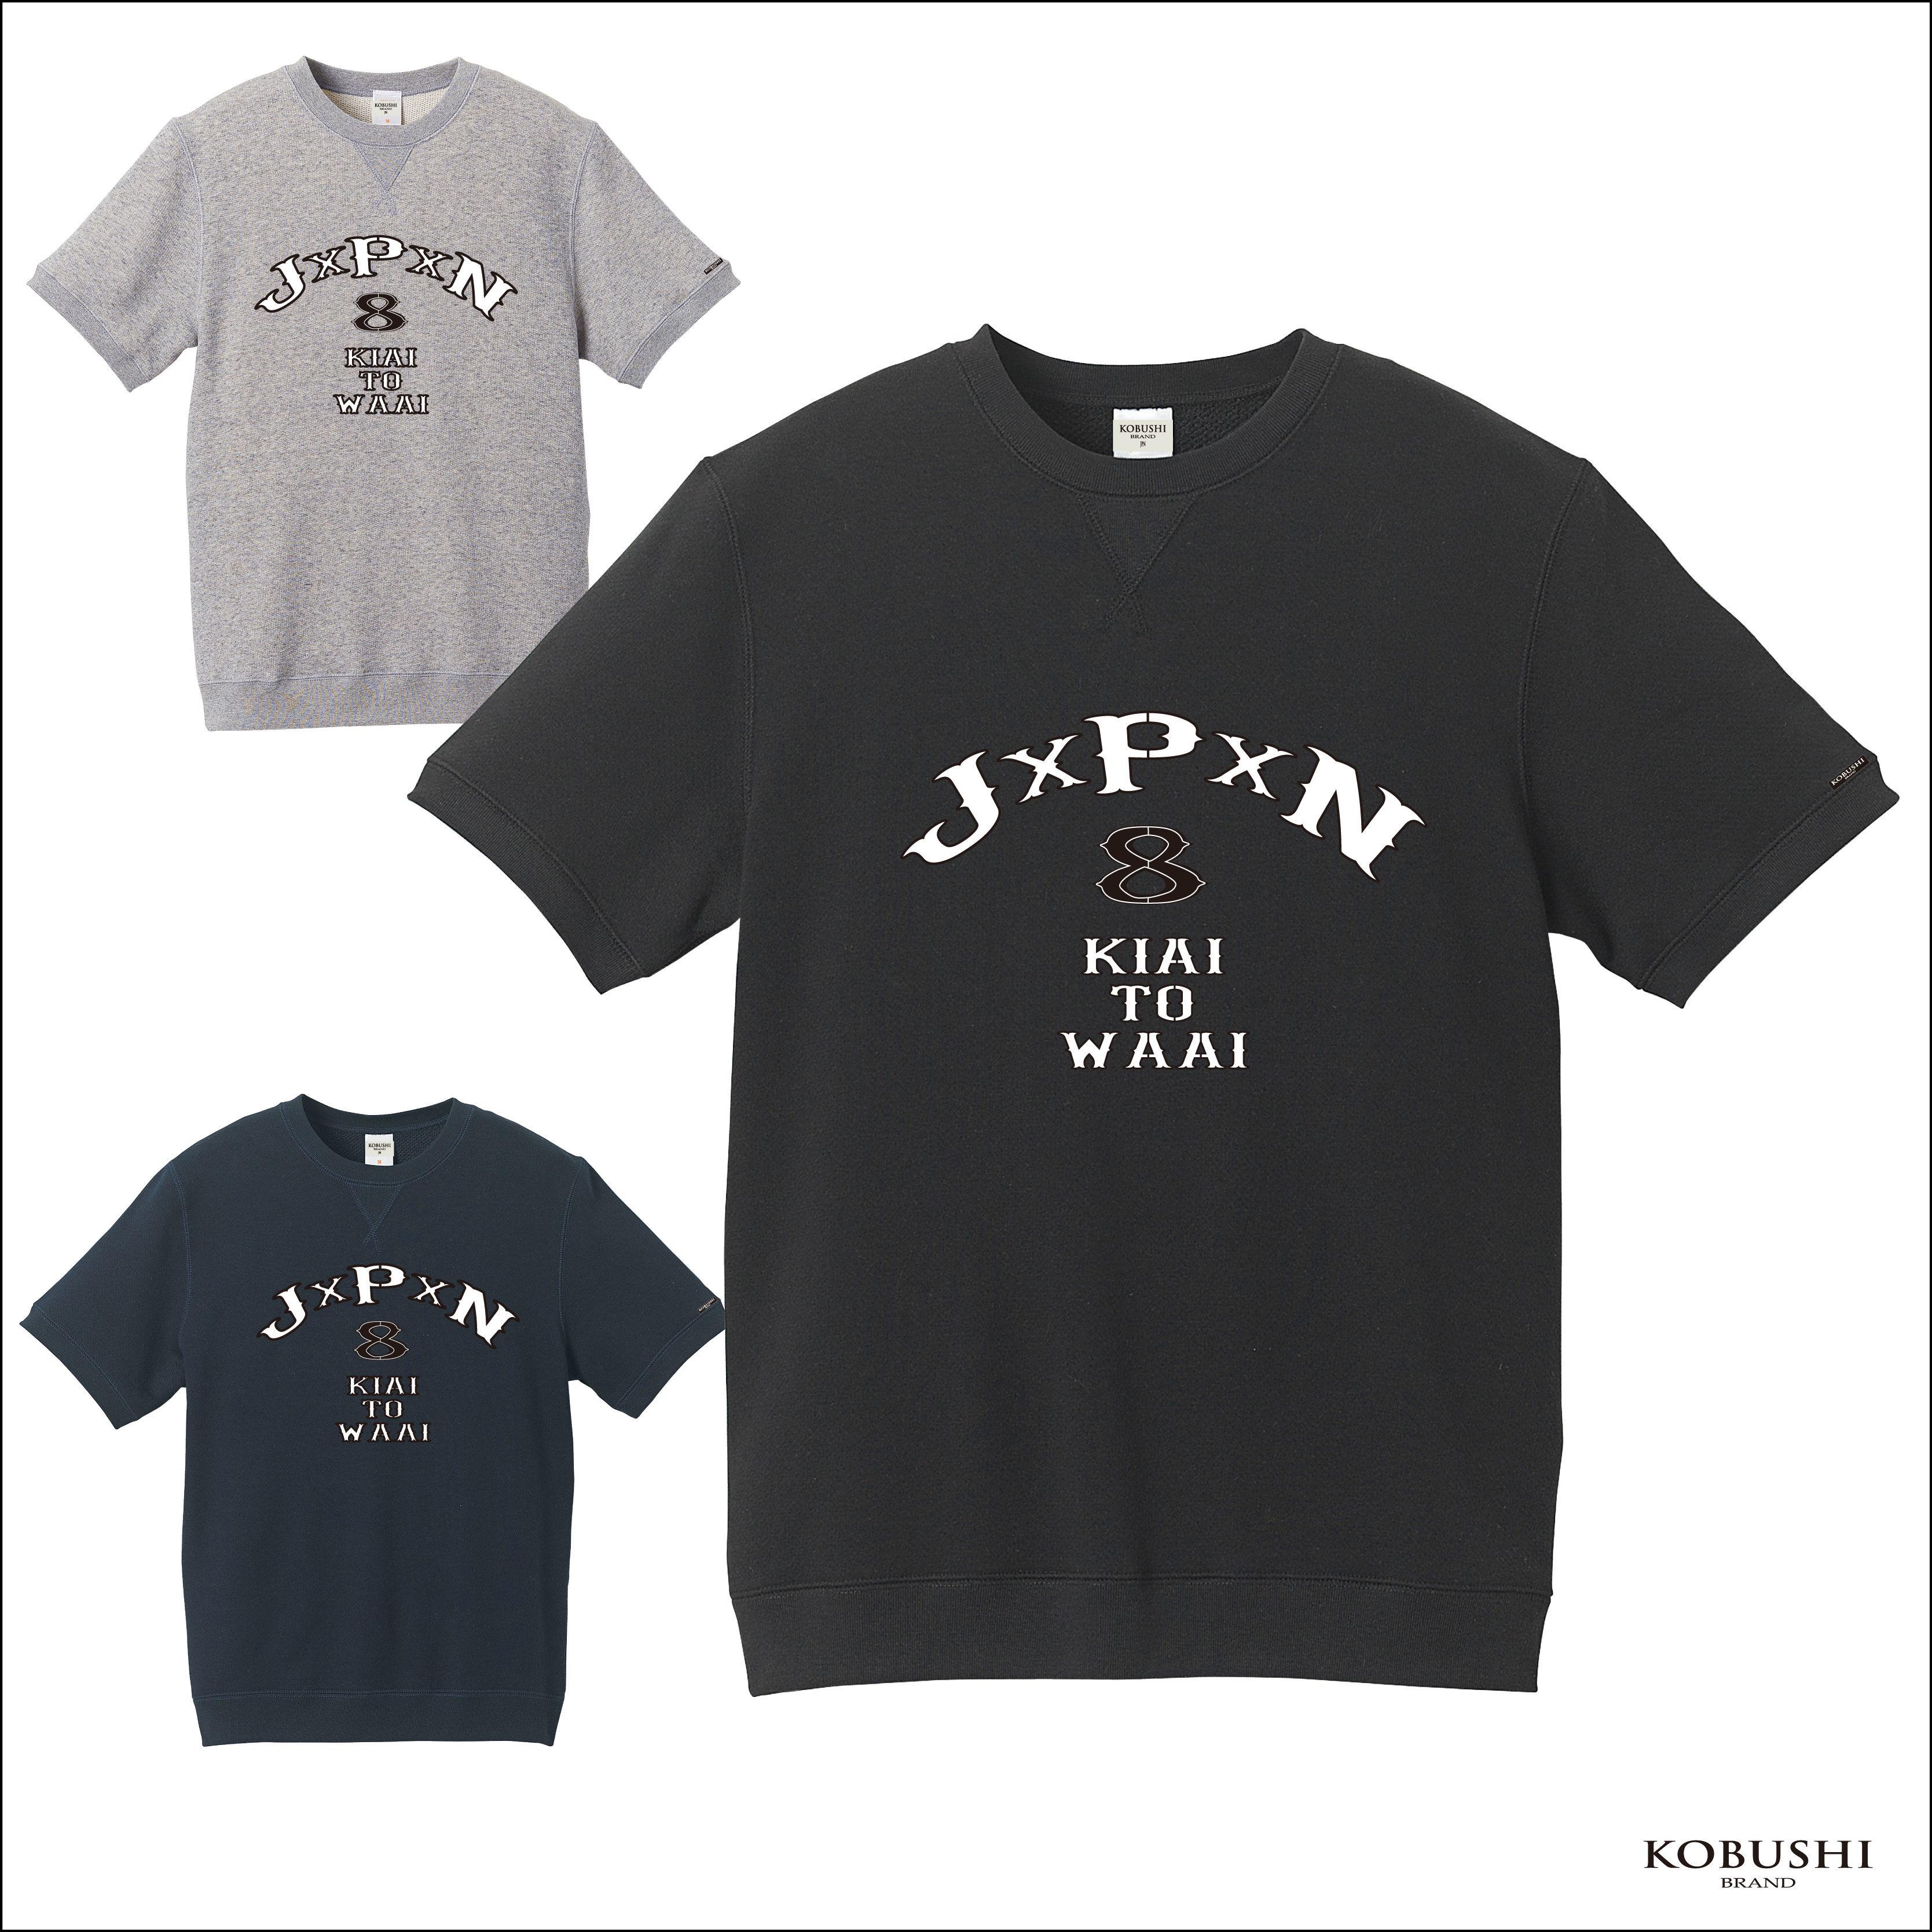 【SPECIAL】KIAI&WAAI SWEAT T-SHIRT / 気合いと和合い スウェットTシャツ J-GREN拳太 和柄 KOBUSHI BRAND/拳BRAND/コブシブランド